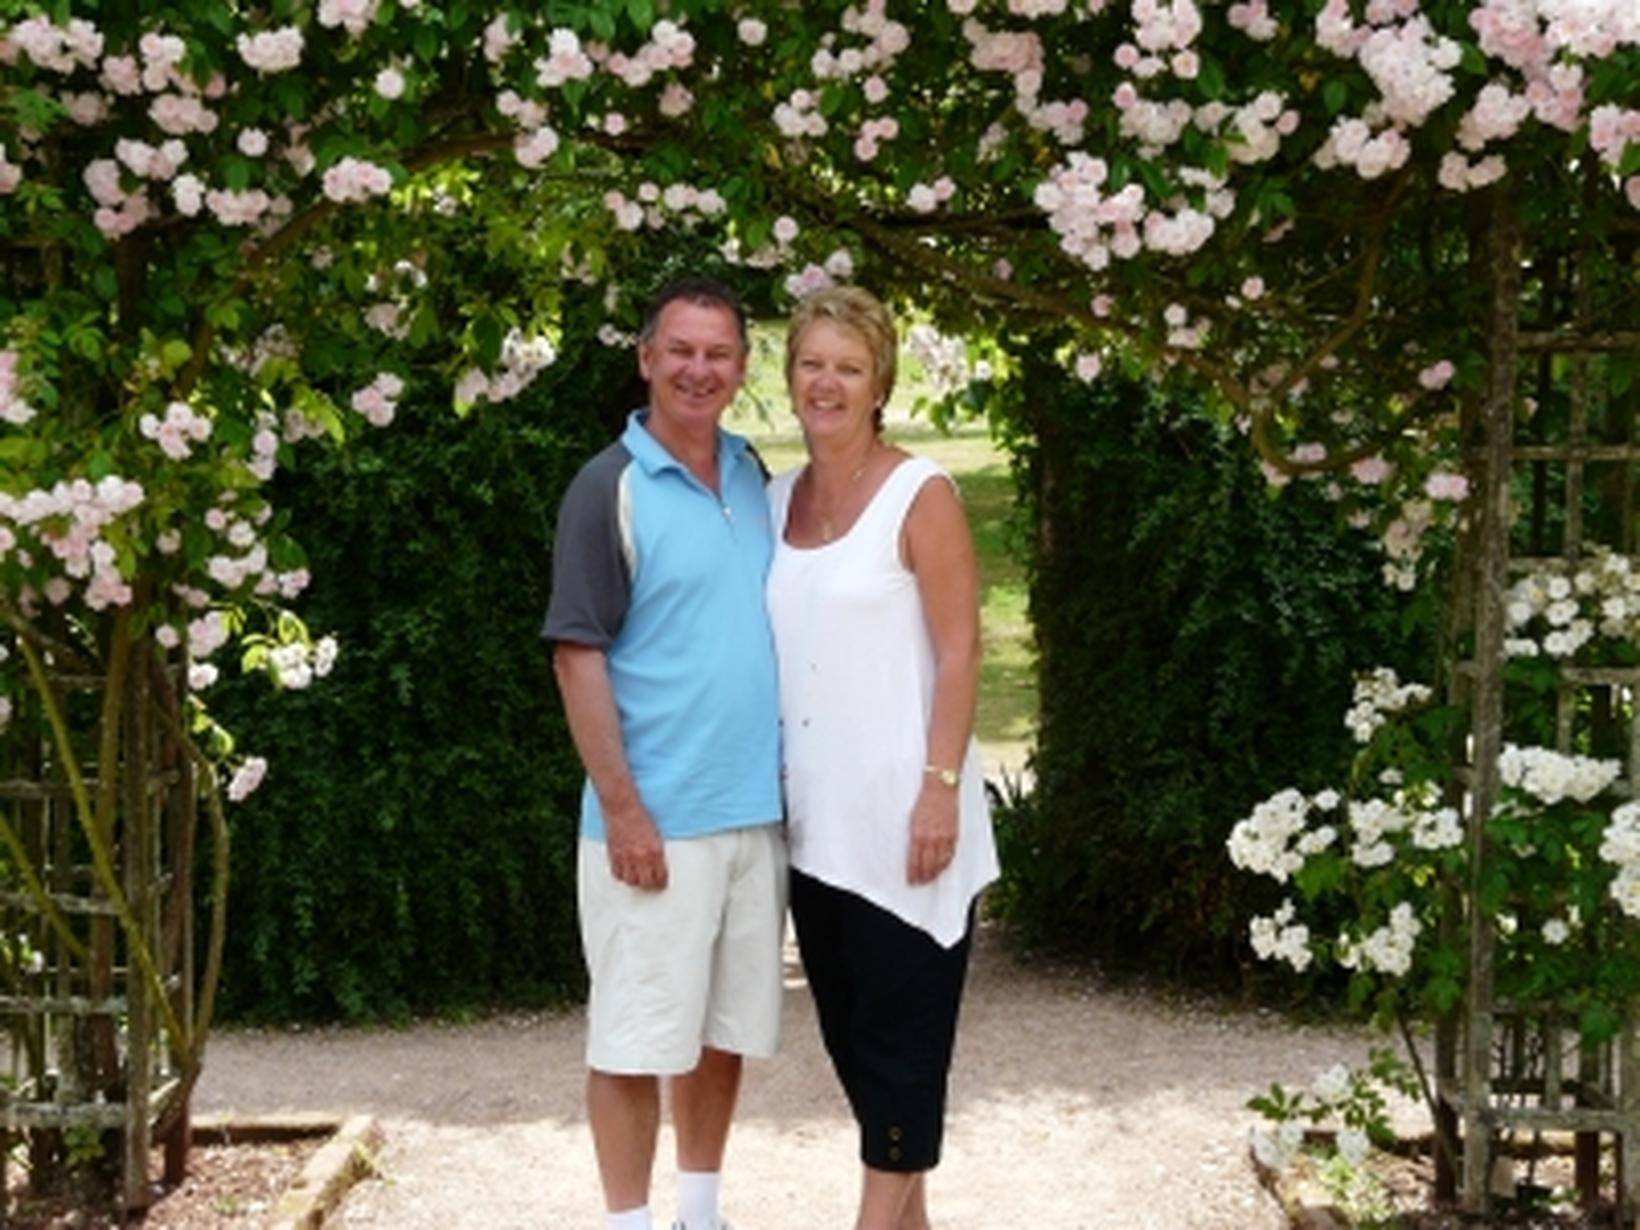 Glenn & Jacqueline from Phillip Island, Victoria, Australia